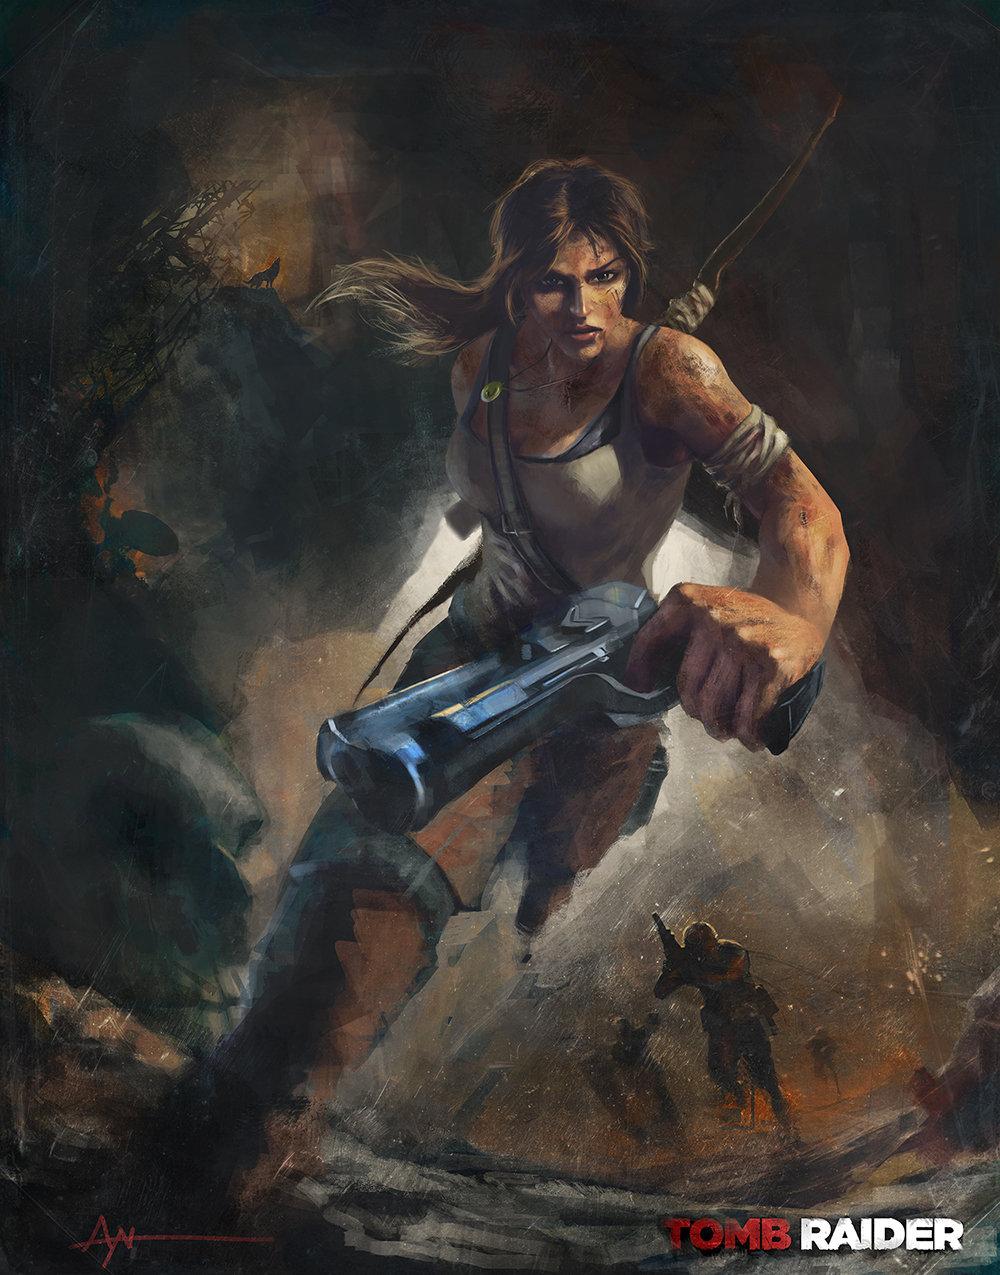 Tomb raider reborn by majinprince lowres